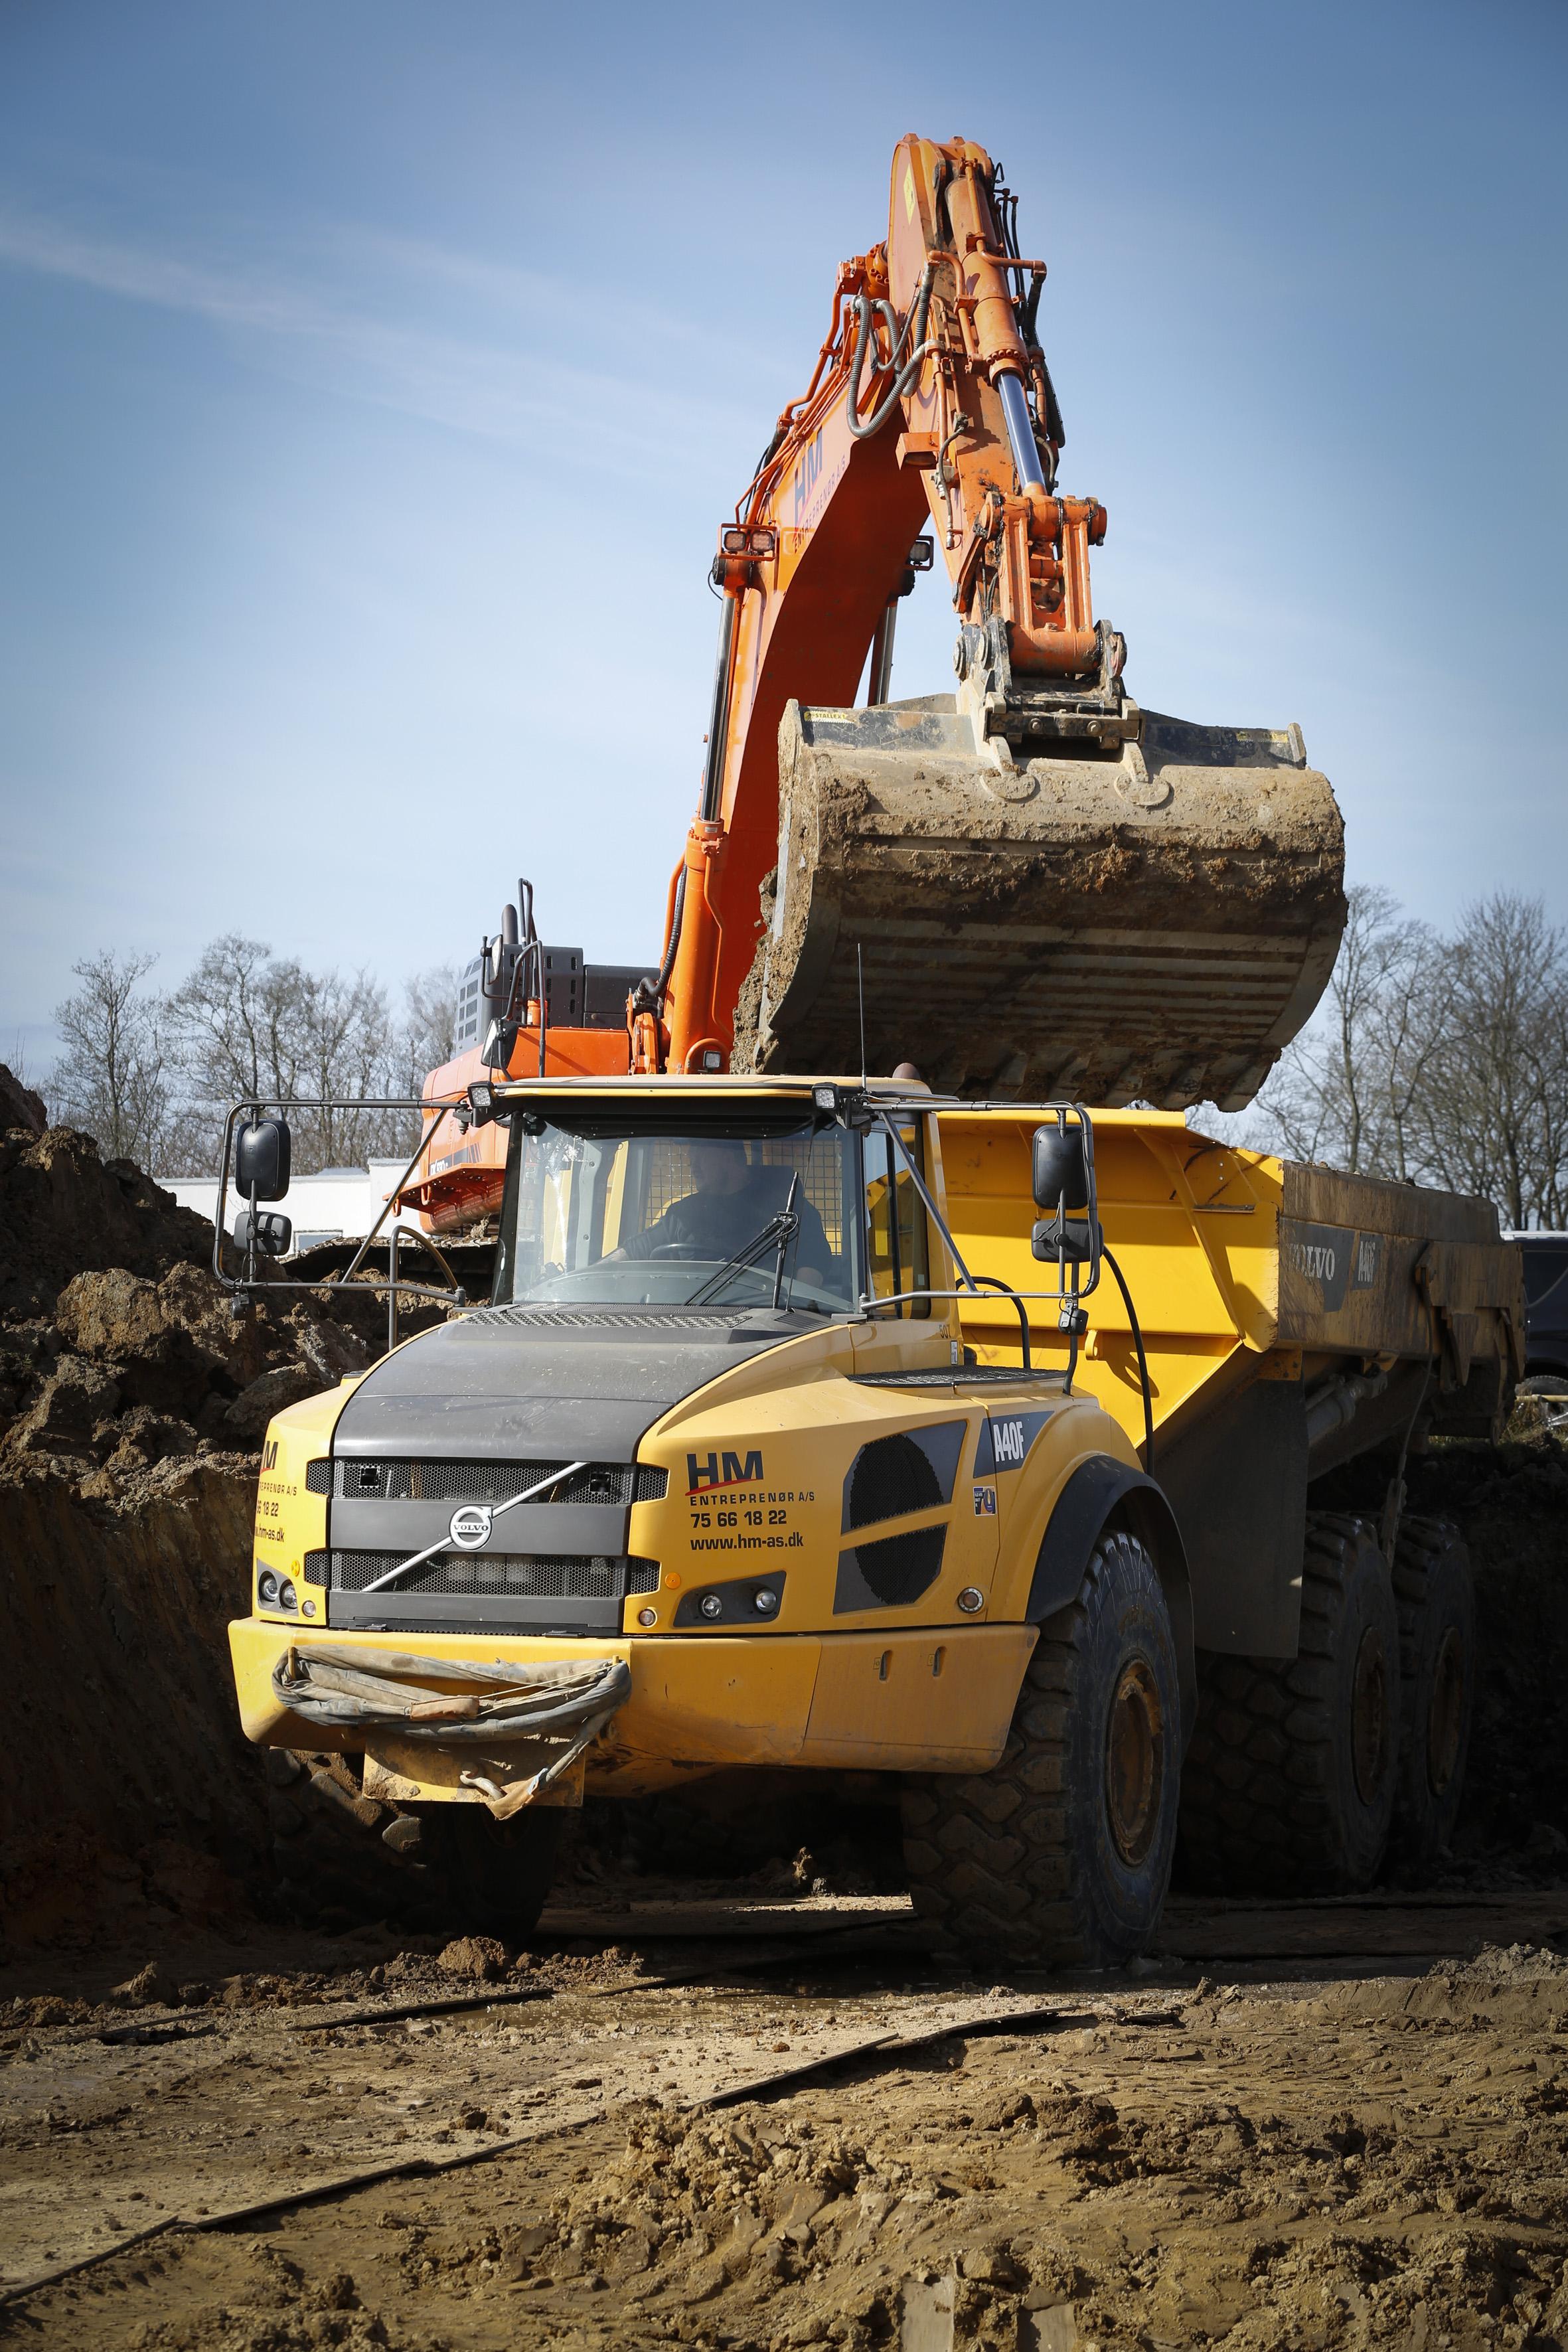 Entreprenør med de rette maskiner til jordflytning og